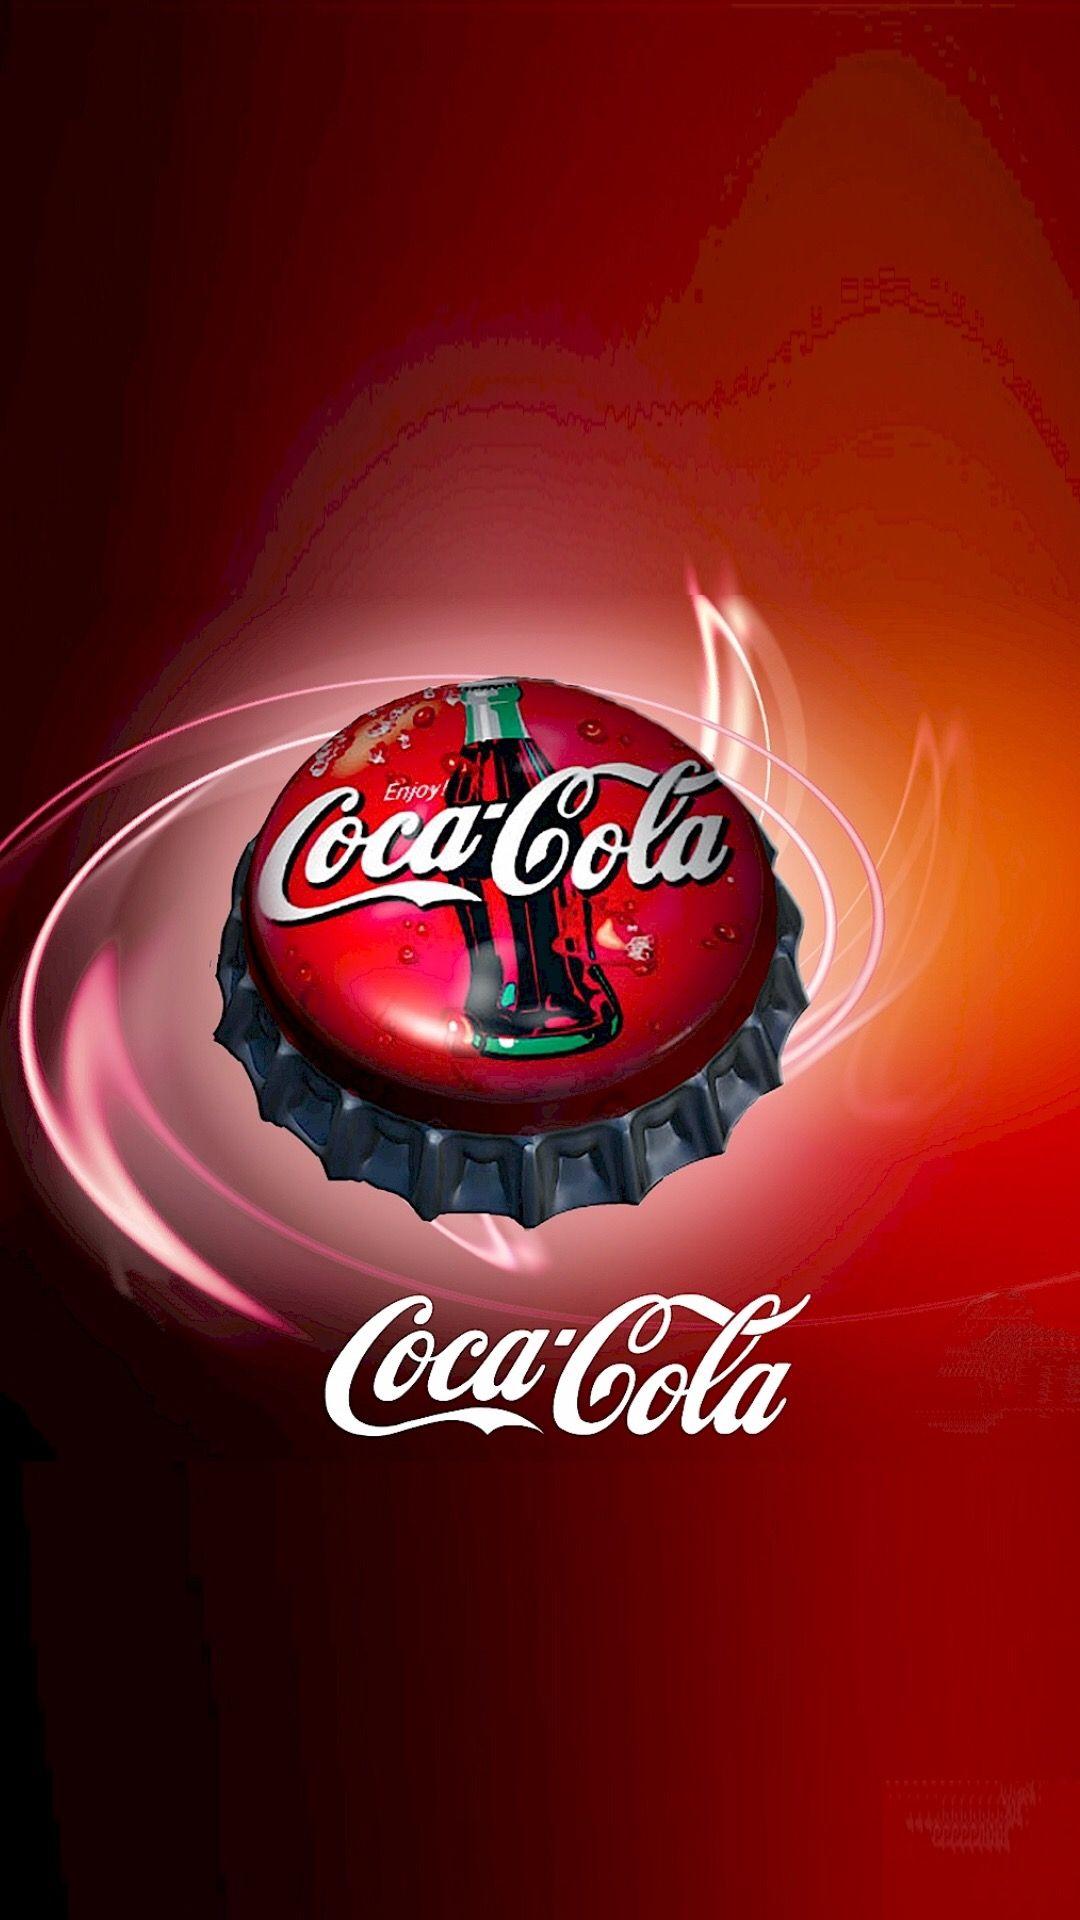 Coca Zero na ketogene Diät